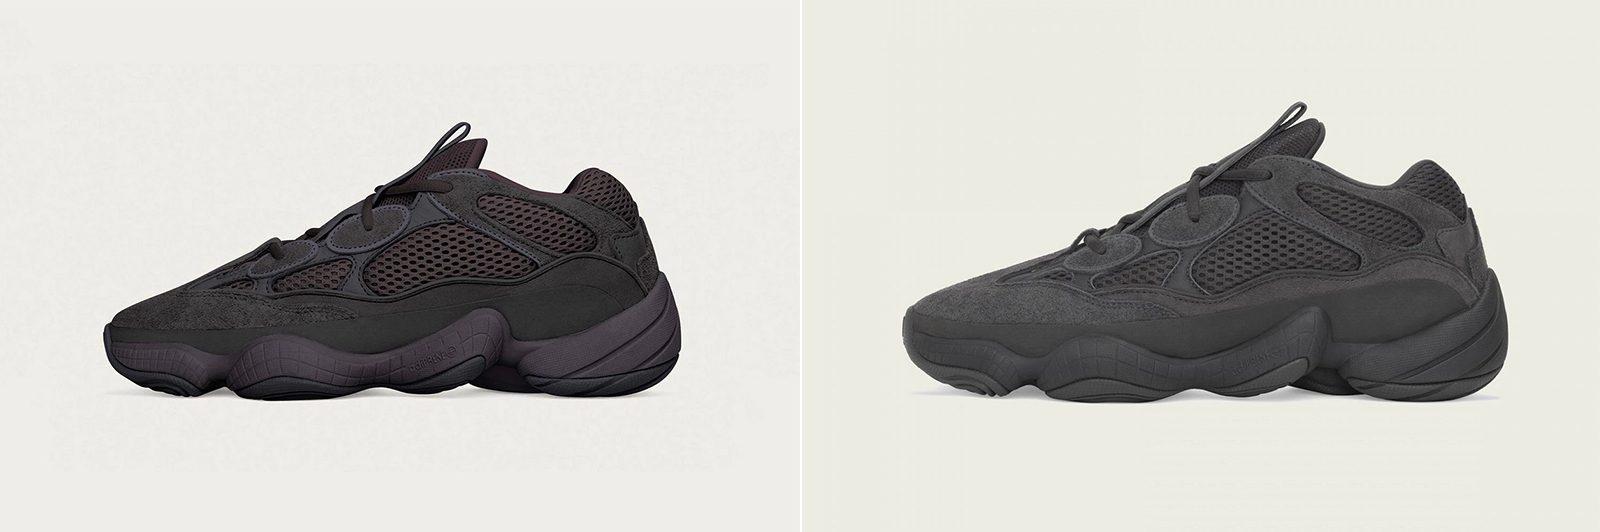 "adidas YEEZY 500 ""Utility Black"""